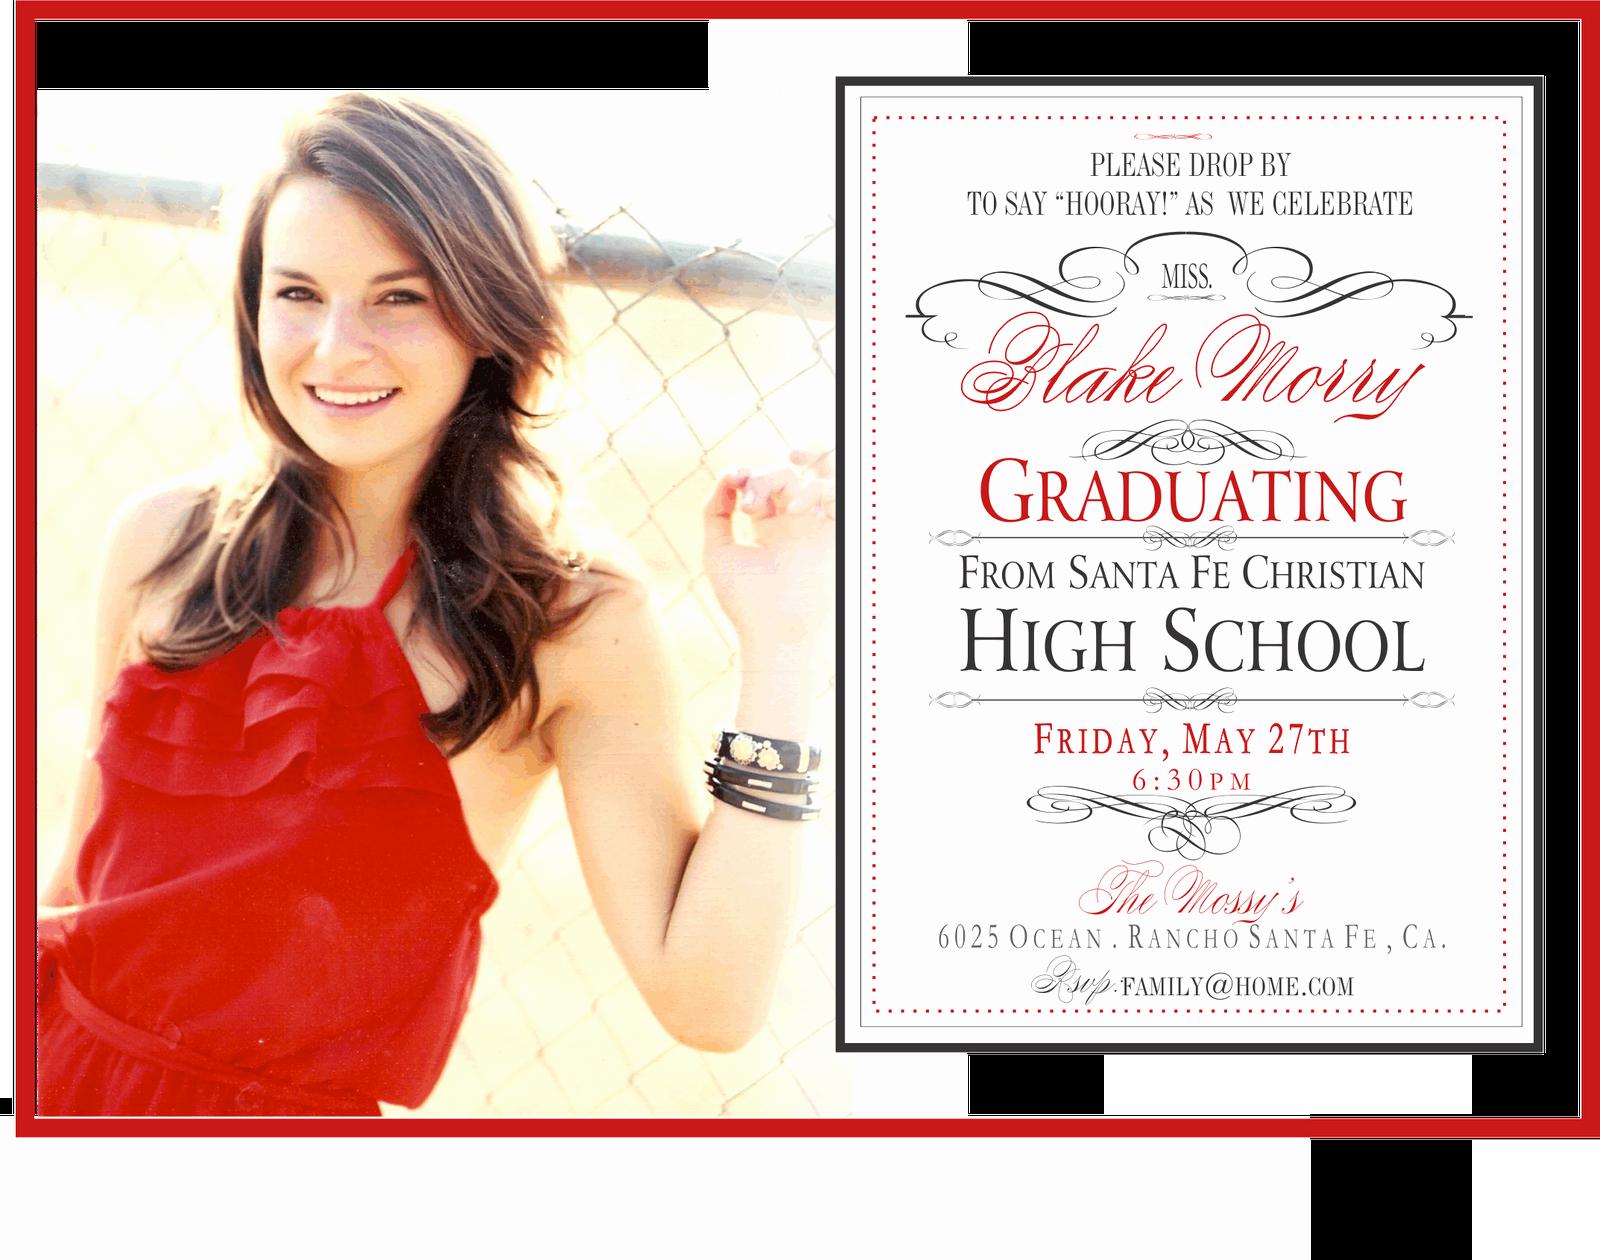 Graduation Celebration Invitation Wording New Line Invitations